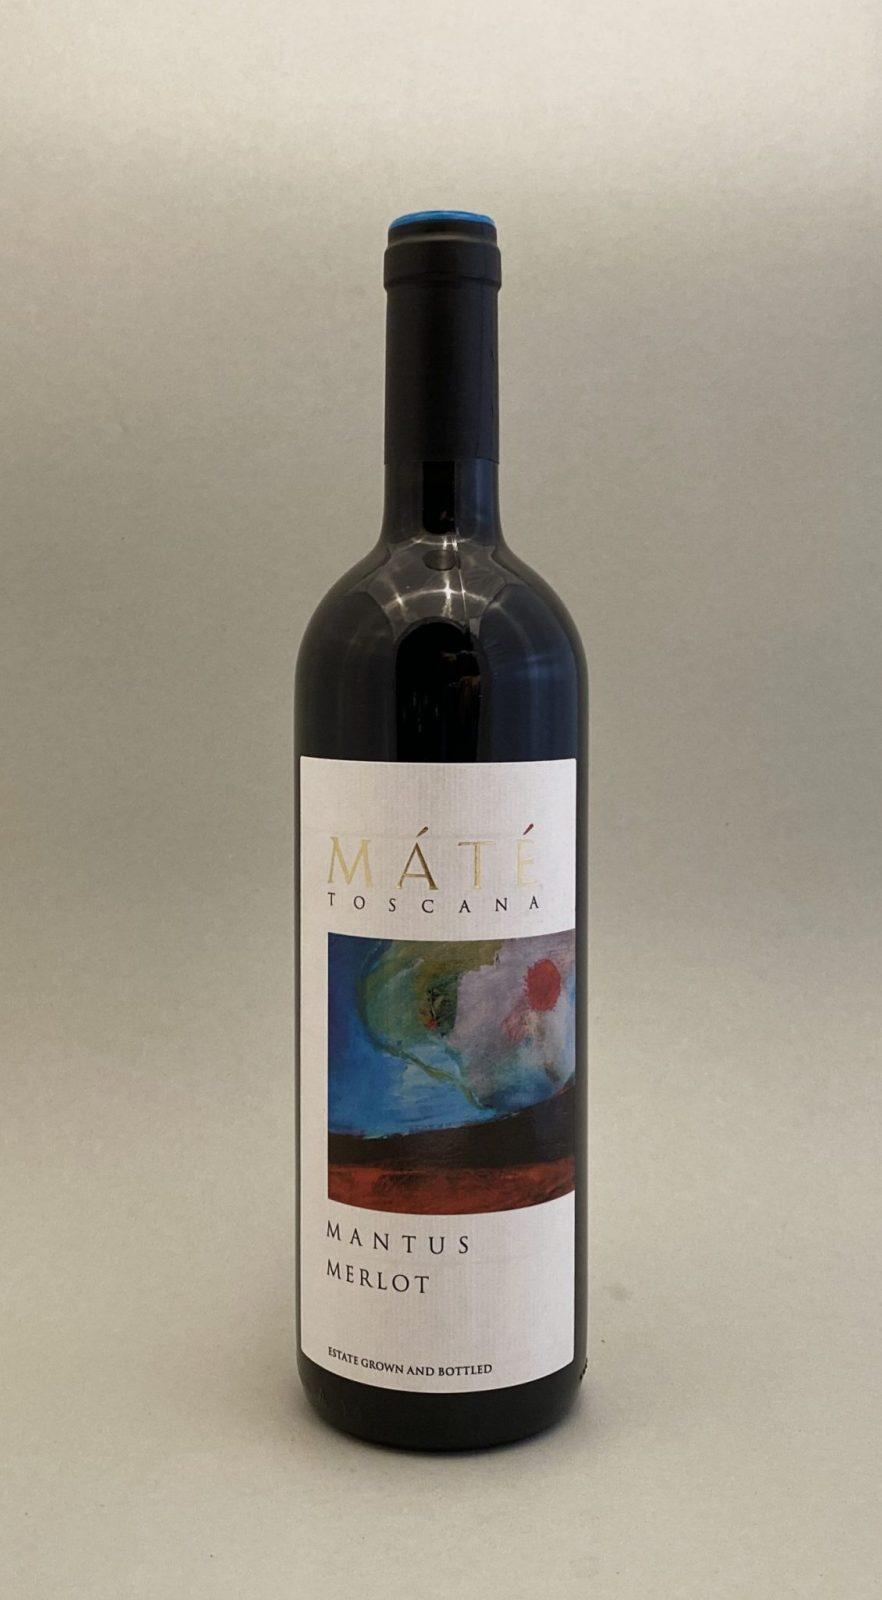 MÁTÉ Mantus Merlot , vinoteka Sunny wines slnecnice mesto, Bratislava petrzalka, vino červené z Talianska, rozvoz vín, eshop